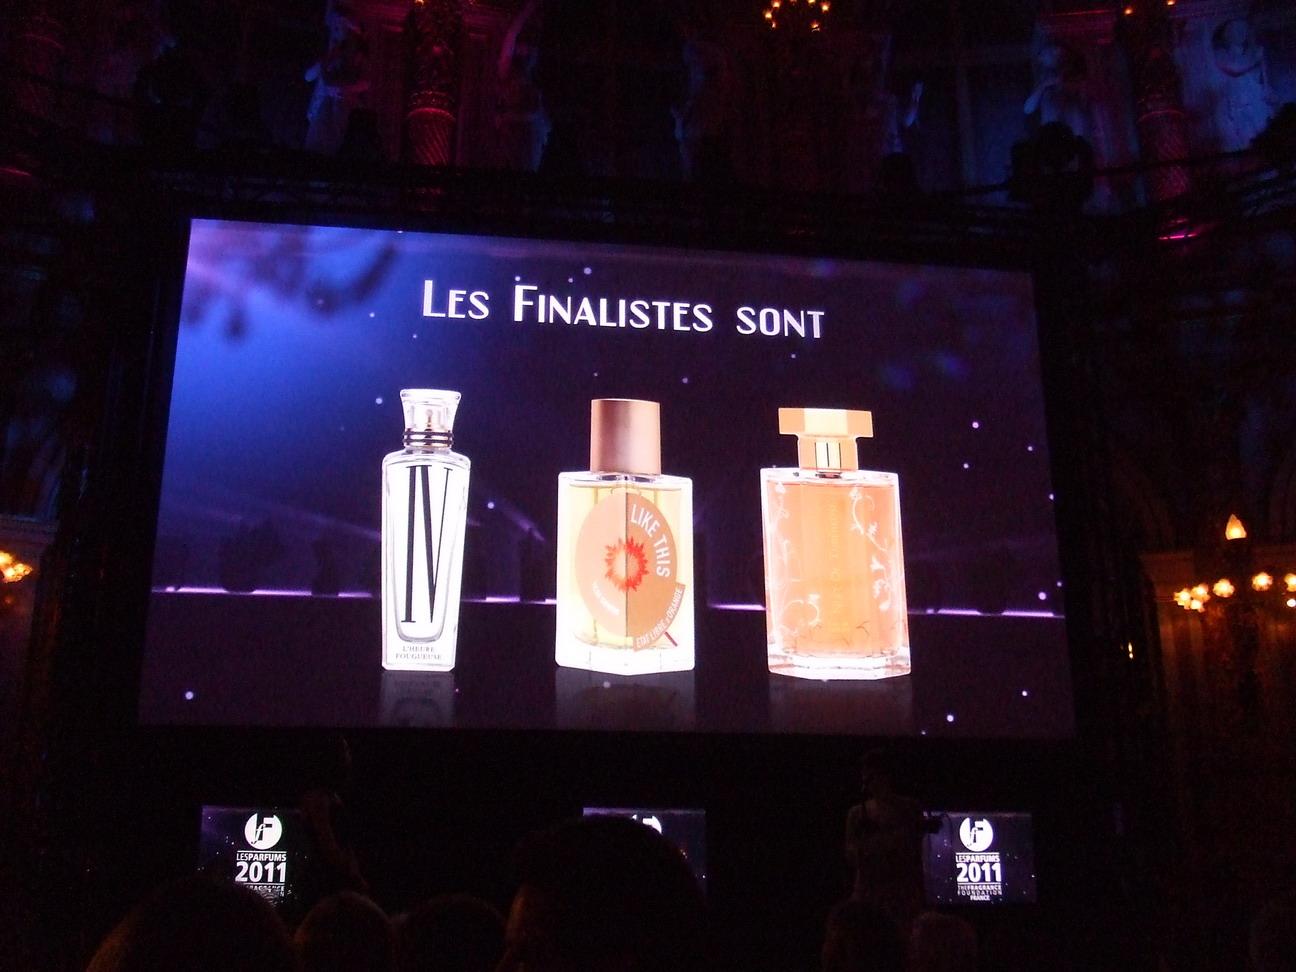 http://3.bp.blogspot.com/-exs56JBM3IA/TcPT4zikTbI/AAAAAAAAH2Y/IChILO_-IjU/s1600/FIFI-Awards-2011-PARIS-10.jpg